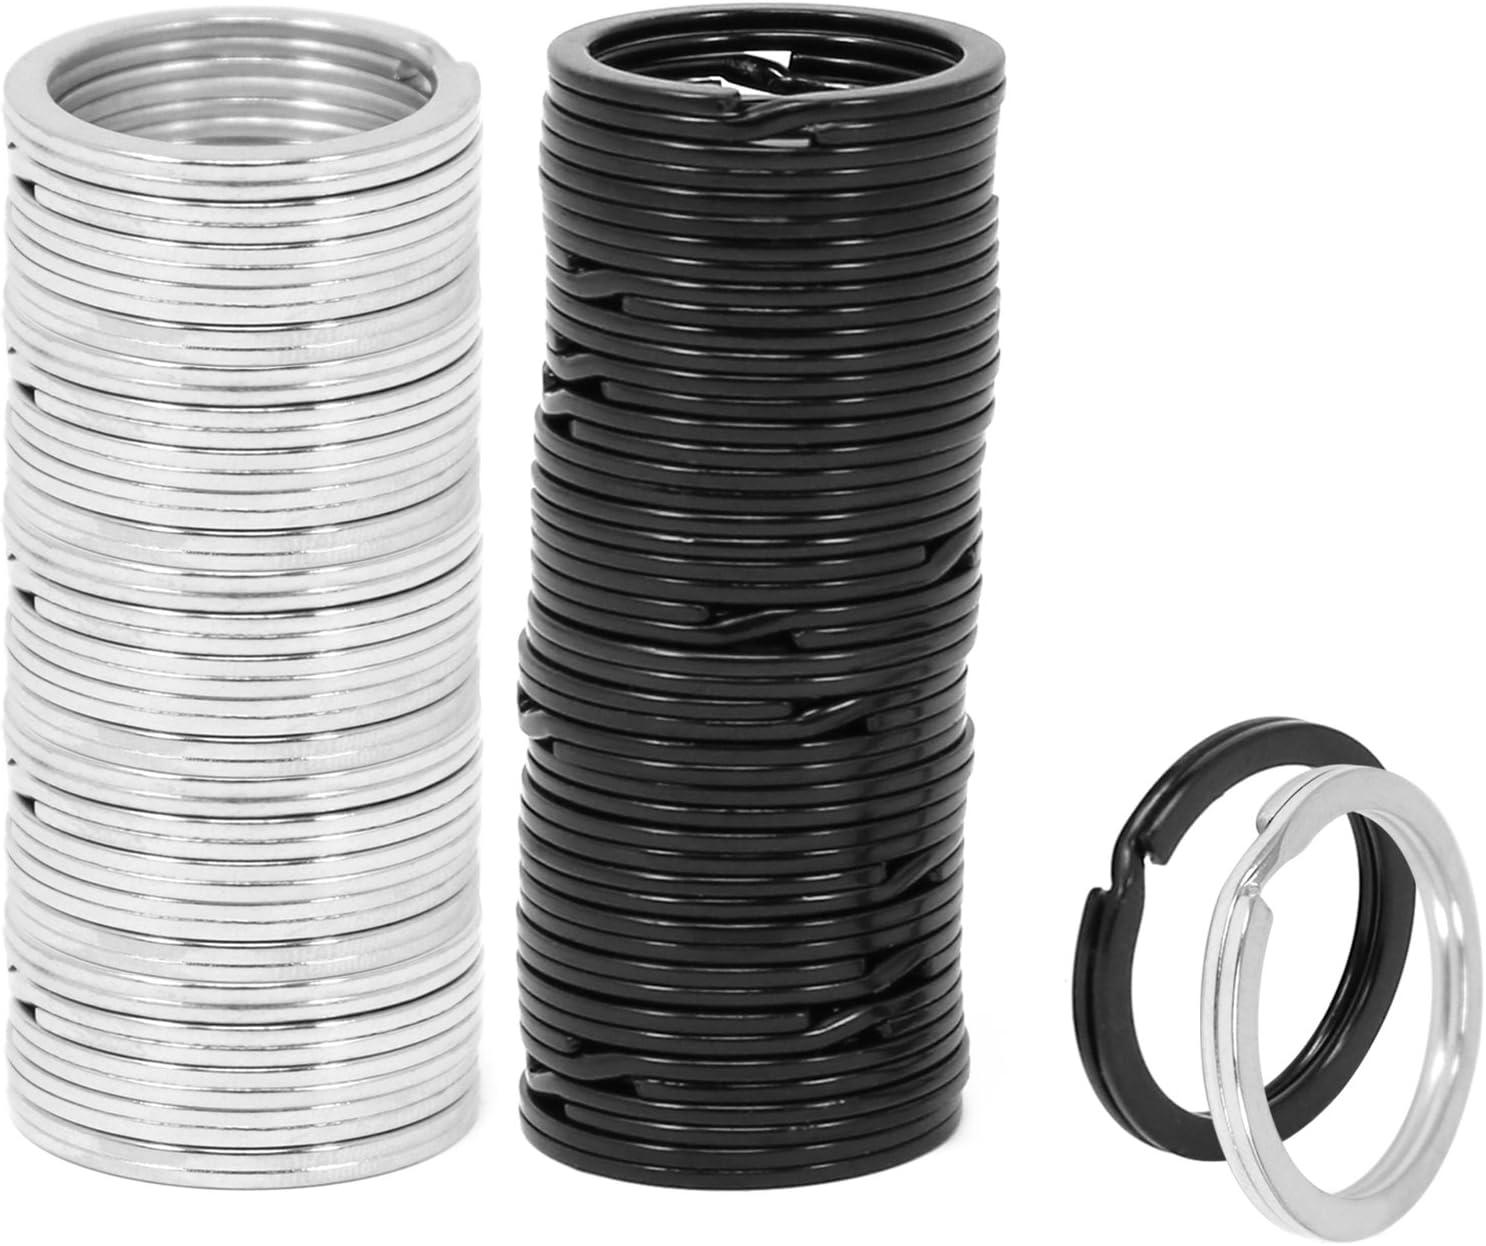 BS005VIT Viton O Ring 0.109 x 0.07